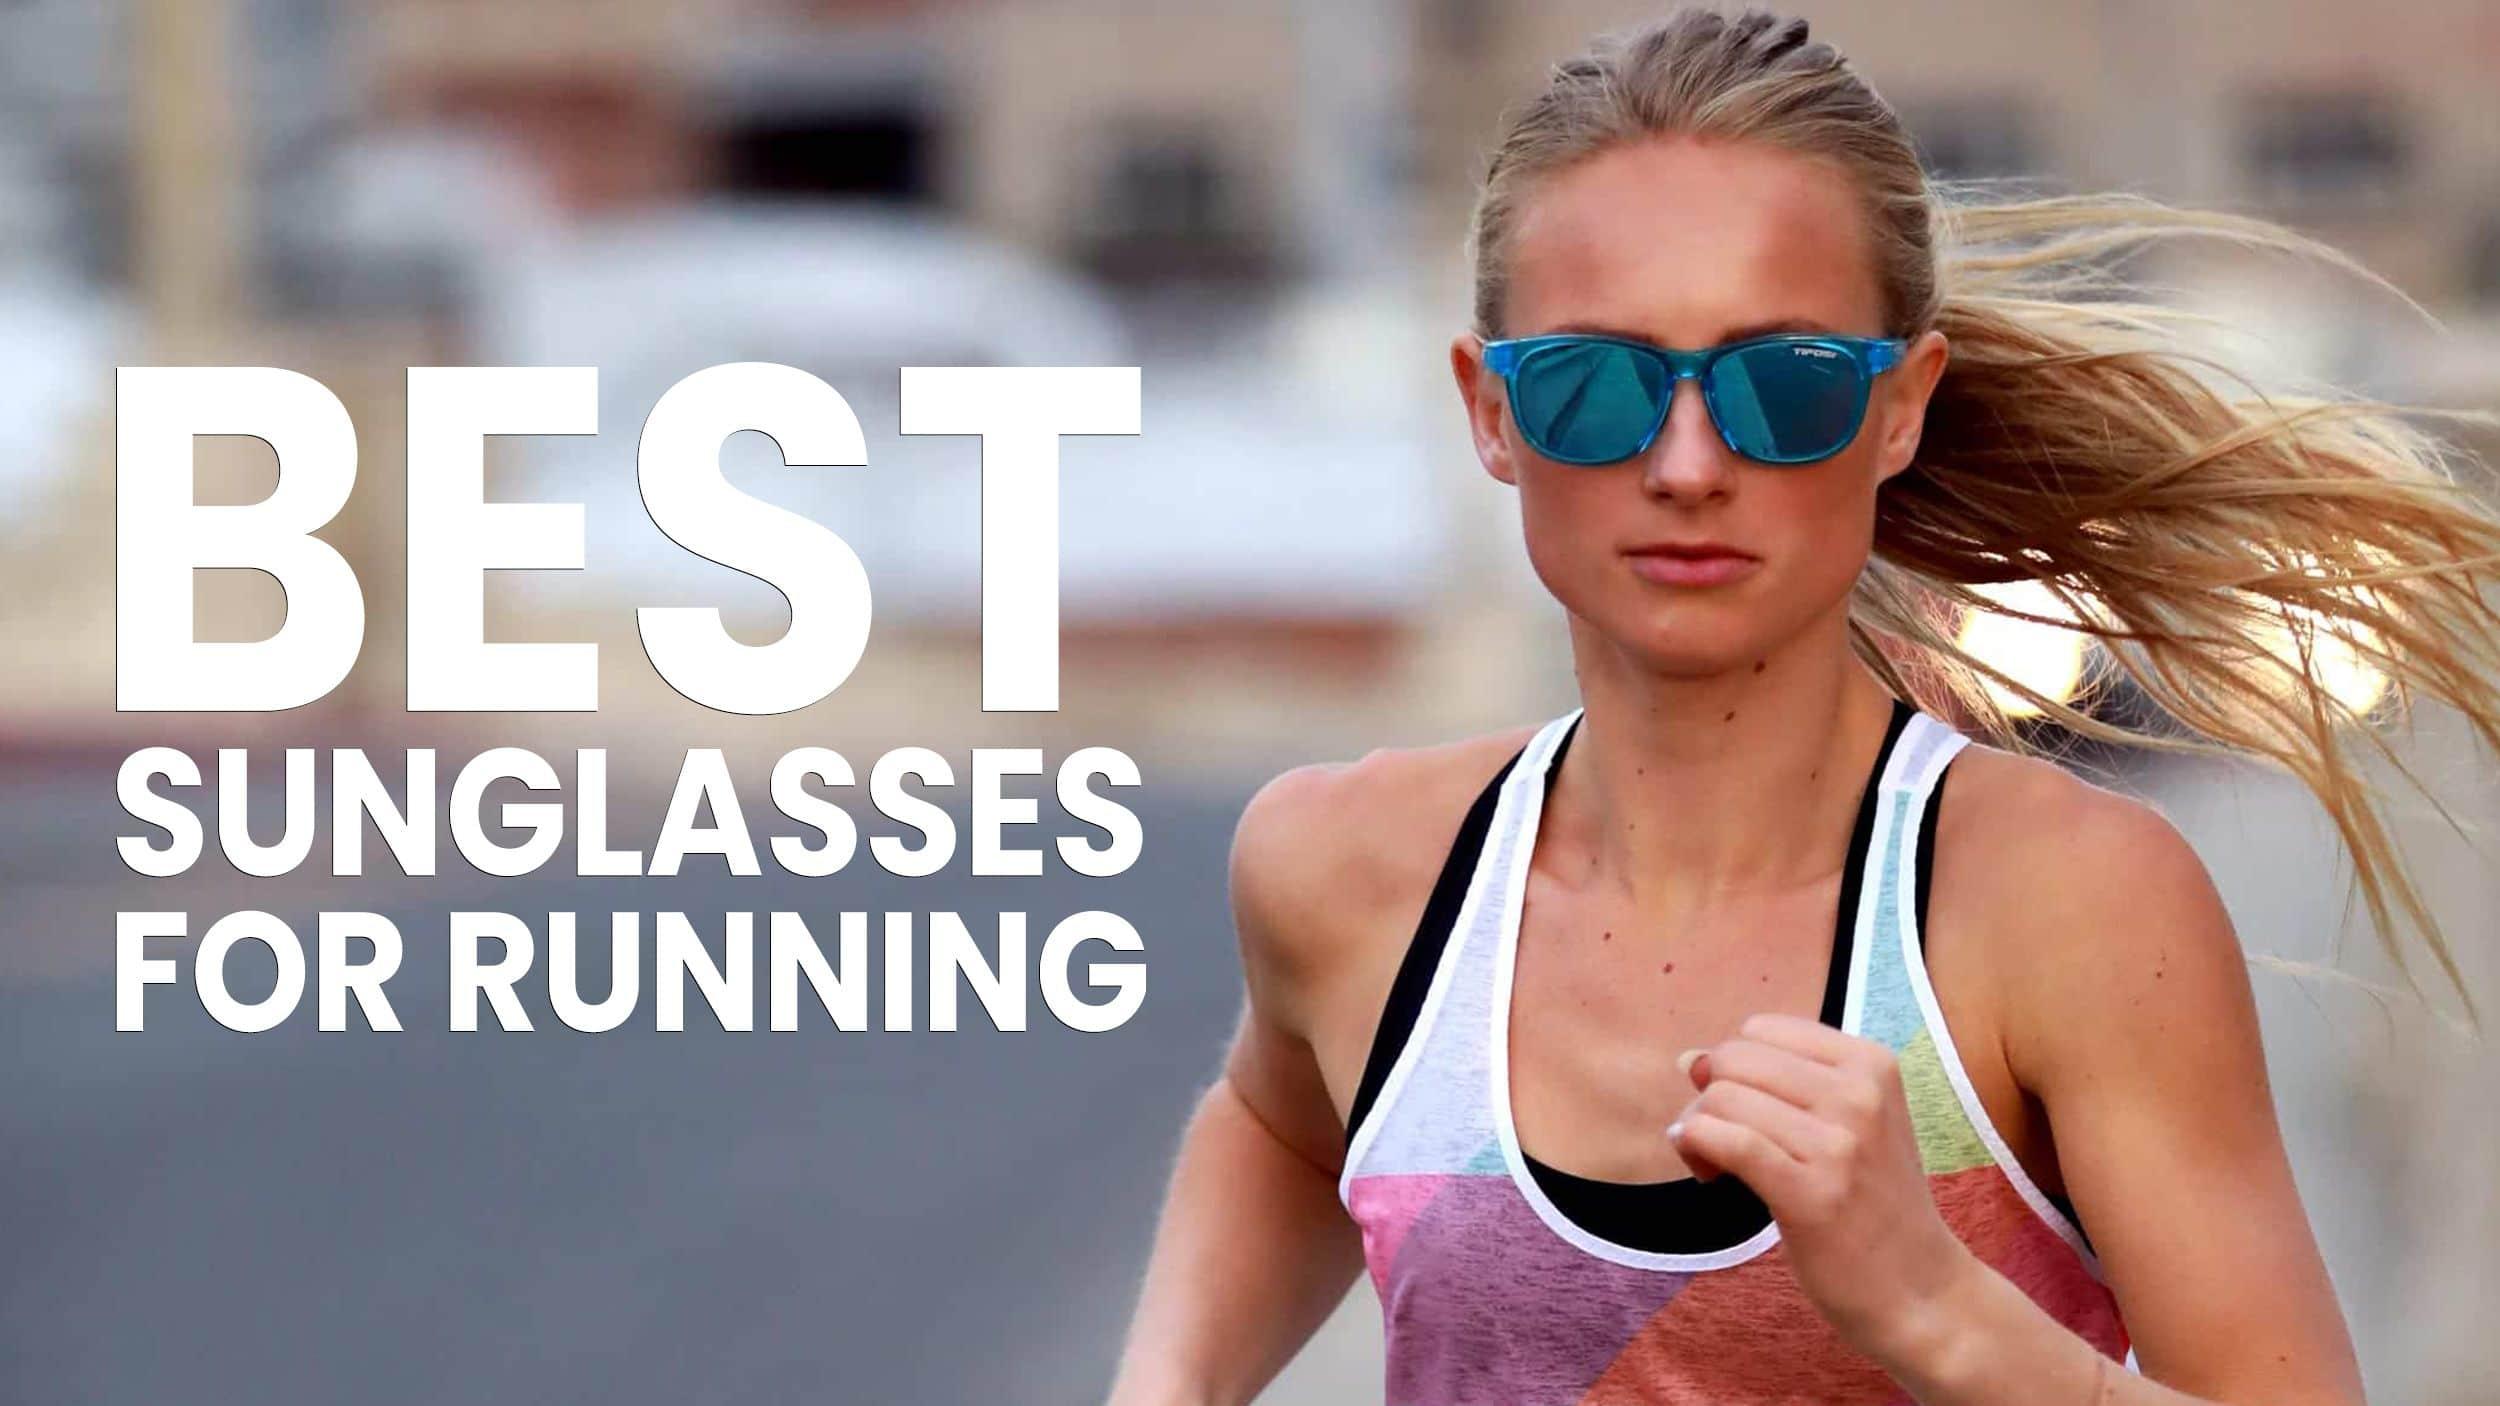 The Top 5 Running Sunglasses Header